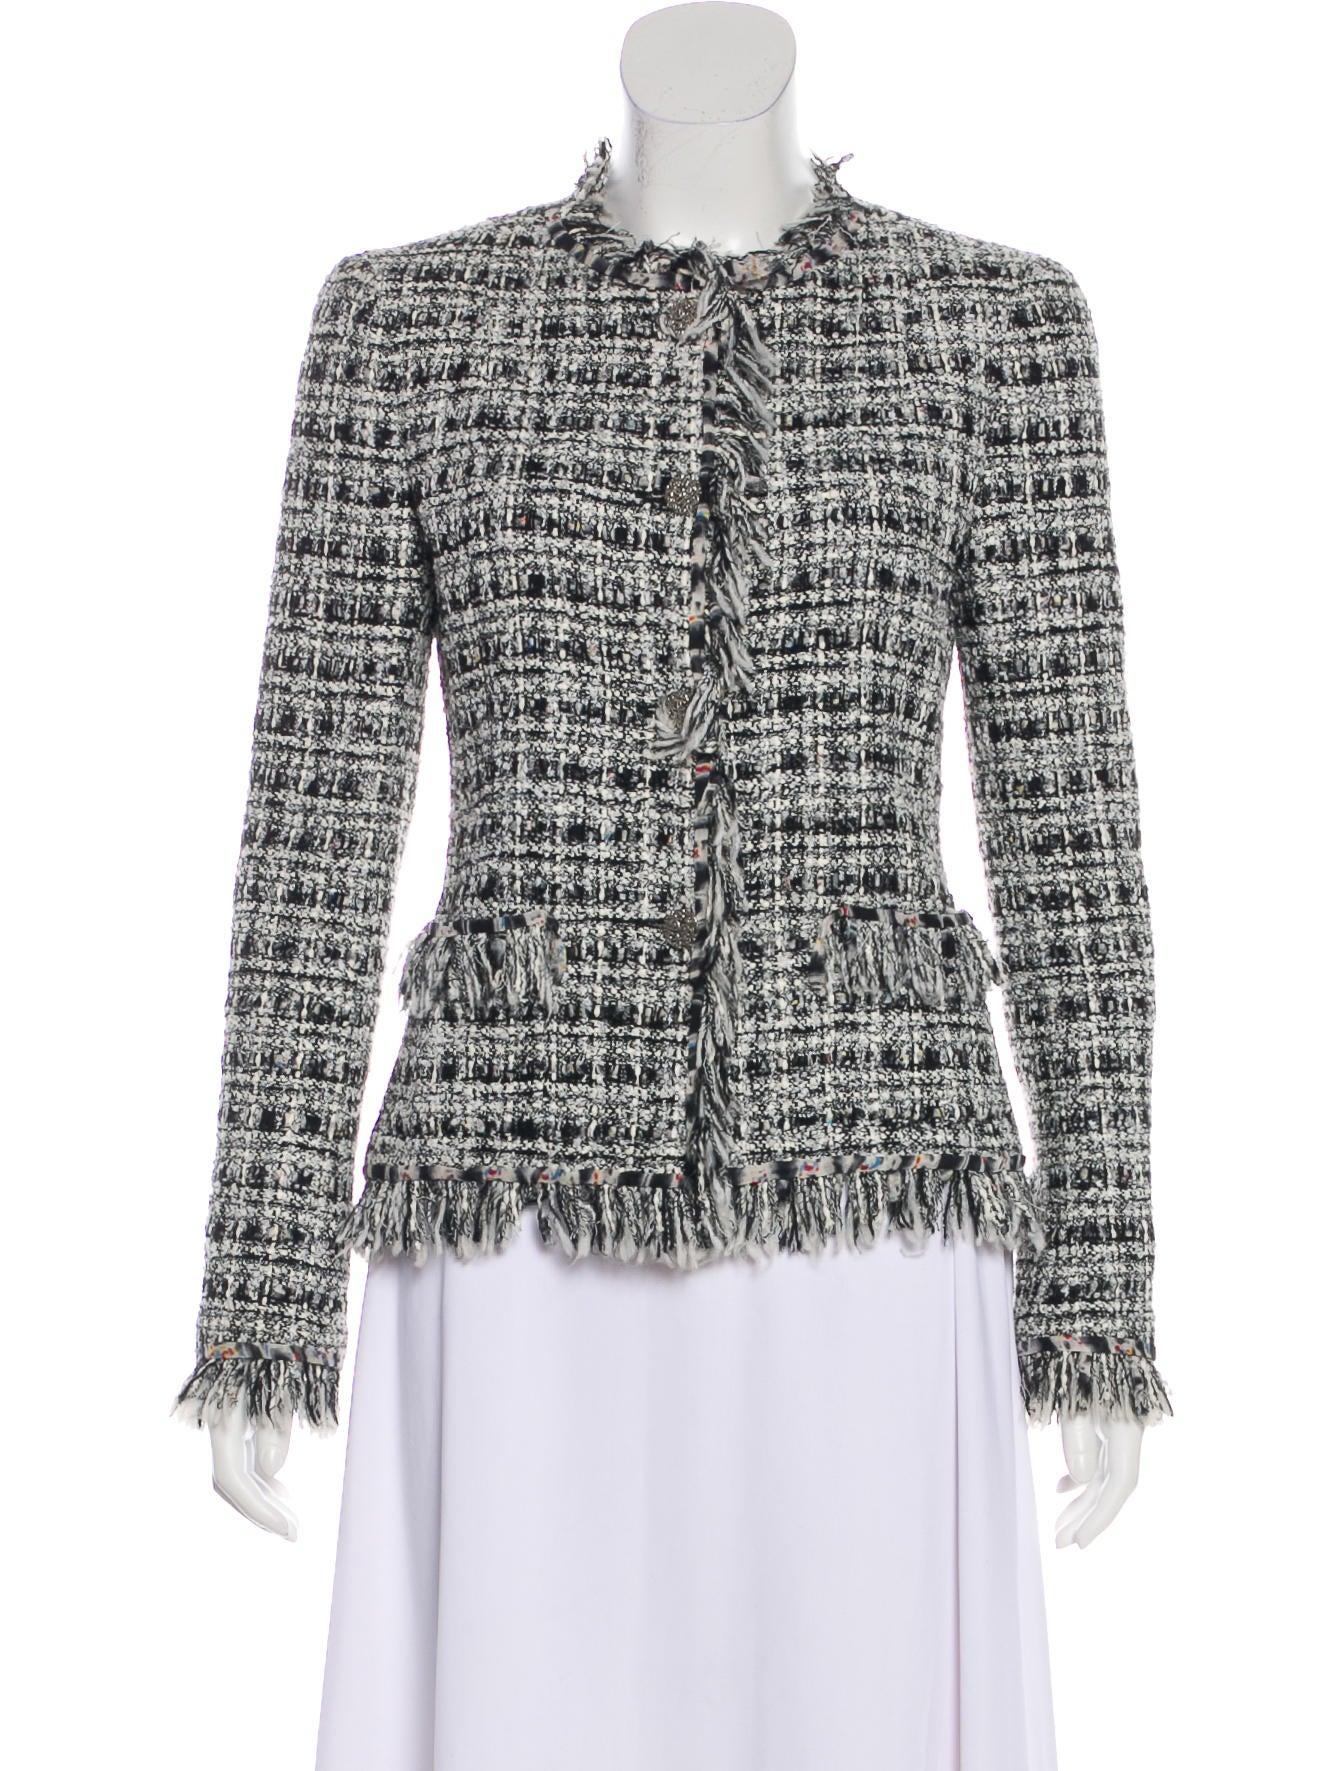 20f7d0ac8 Chanel Tweed Fringe Jacket - Clothing - CHA362371   The RealReal